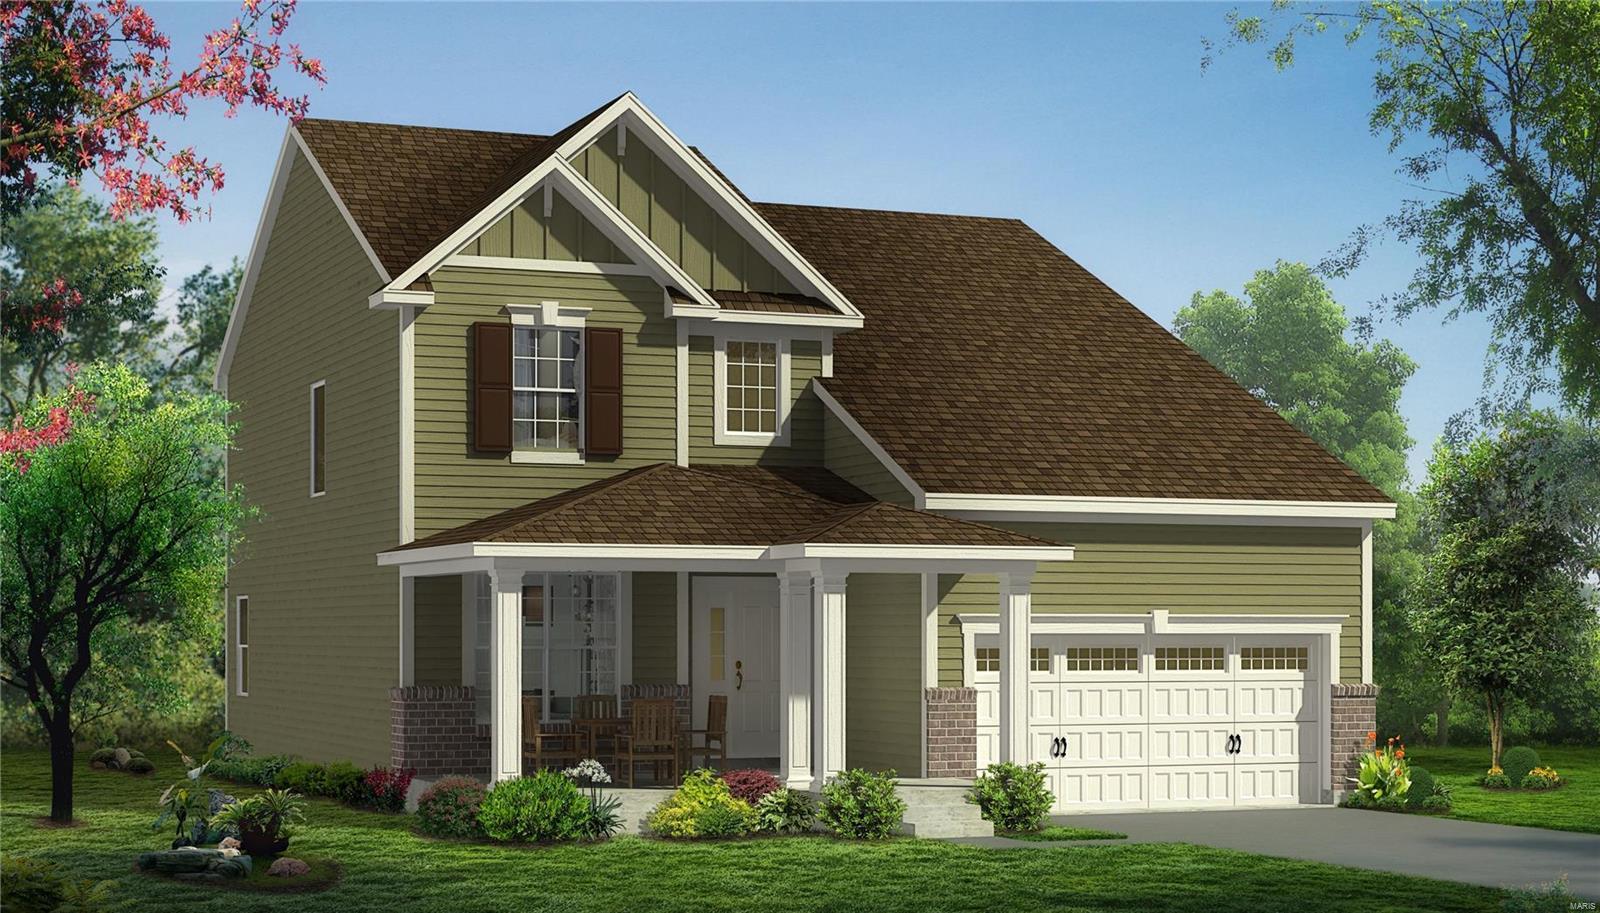 17113 Centaur Station Drive Property Photo - Wildwood, MO real estate listing